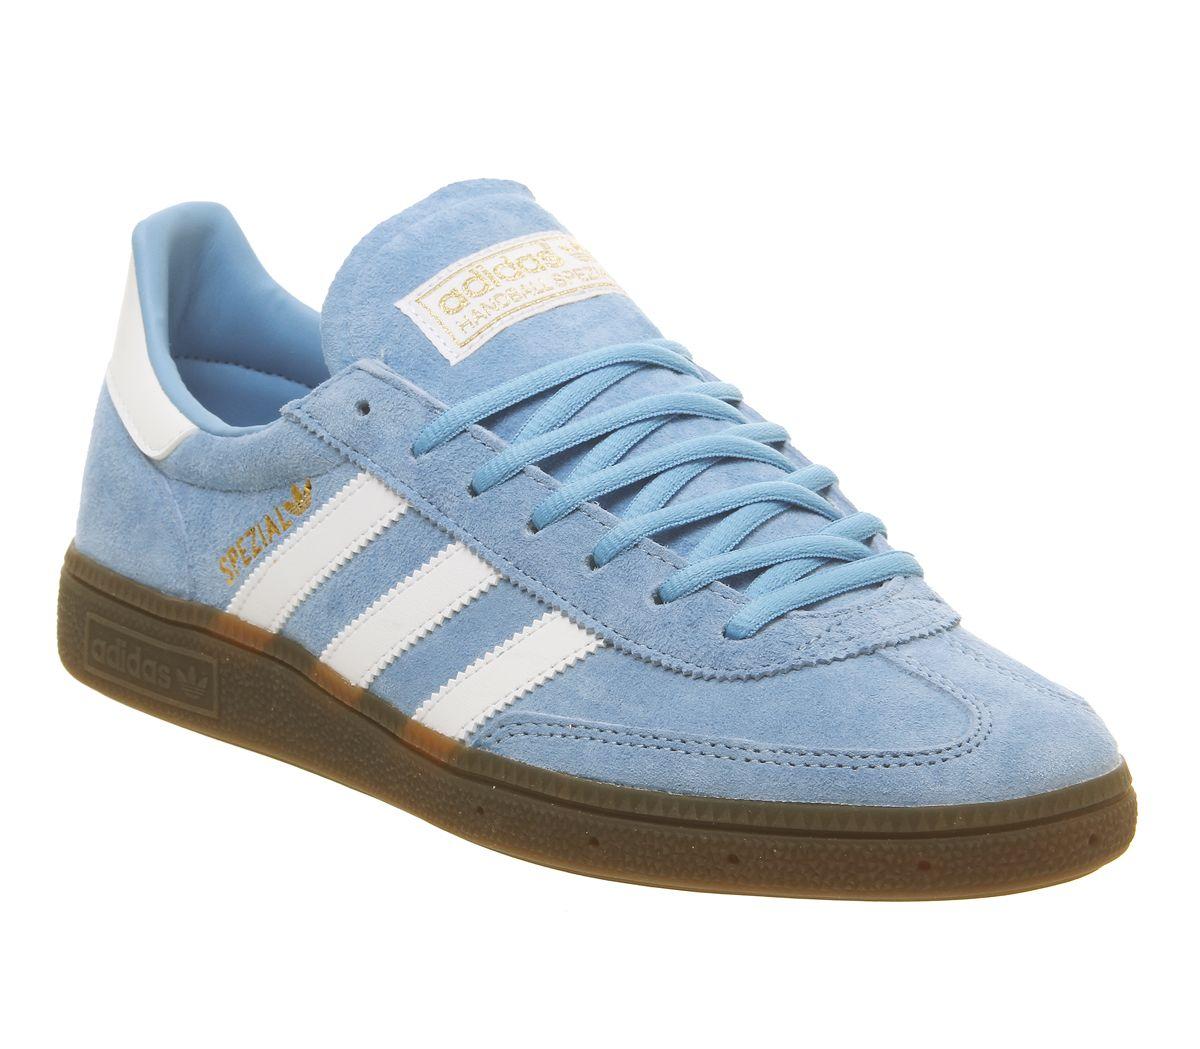 timeless design 6b230 a9ca2 SENTINEL Adidas Handball Spezial formatori luce blu gomma bianca formatori  scarpe